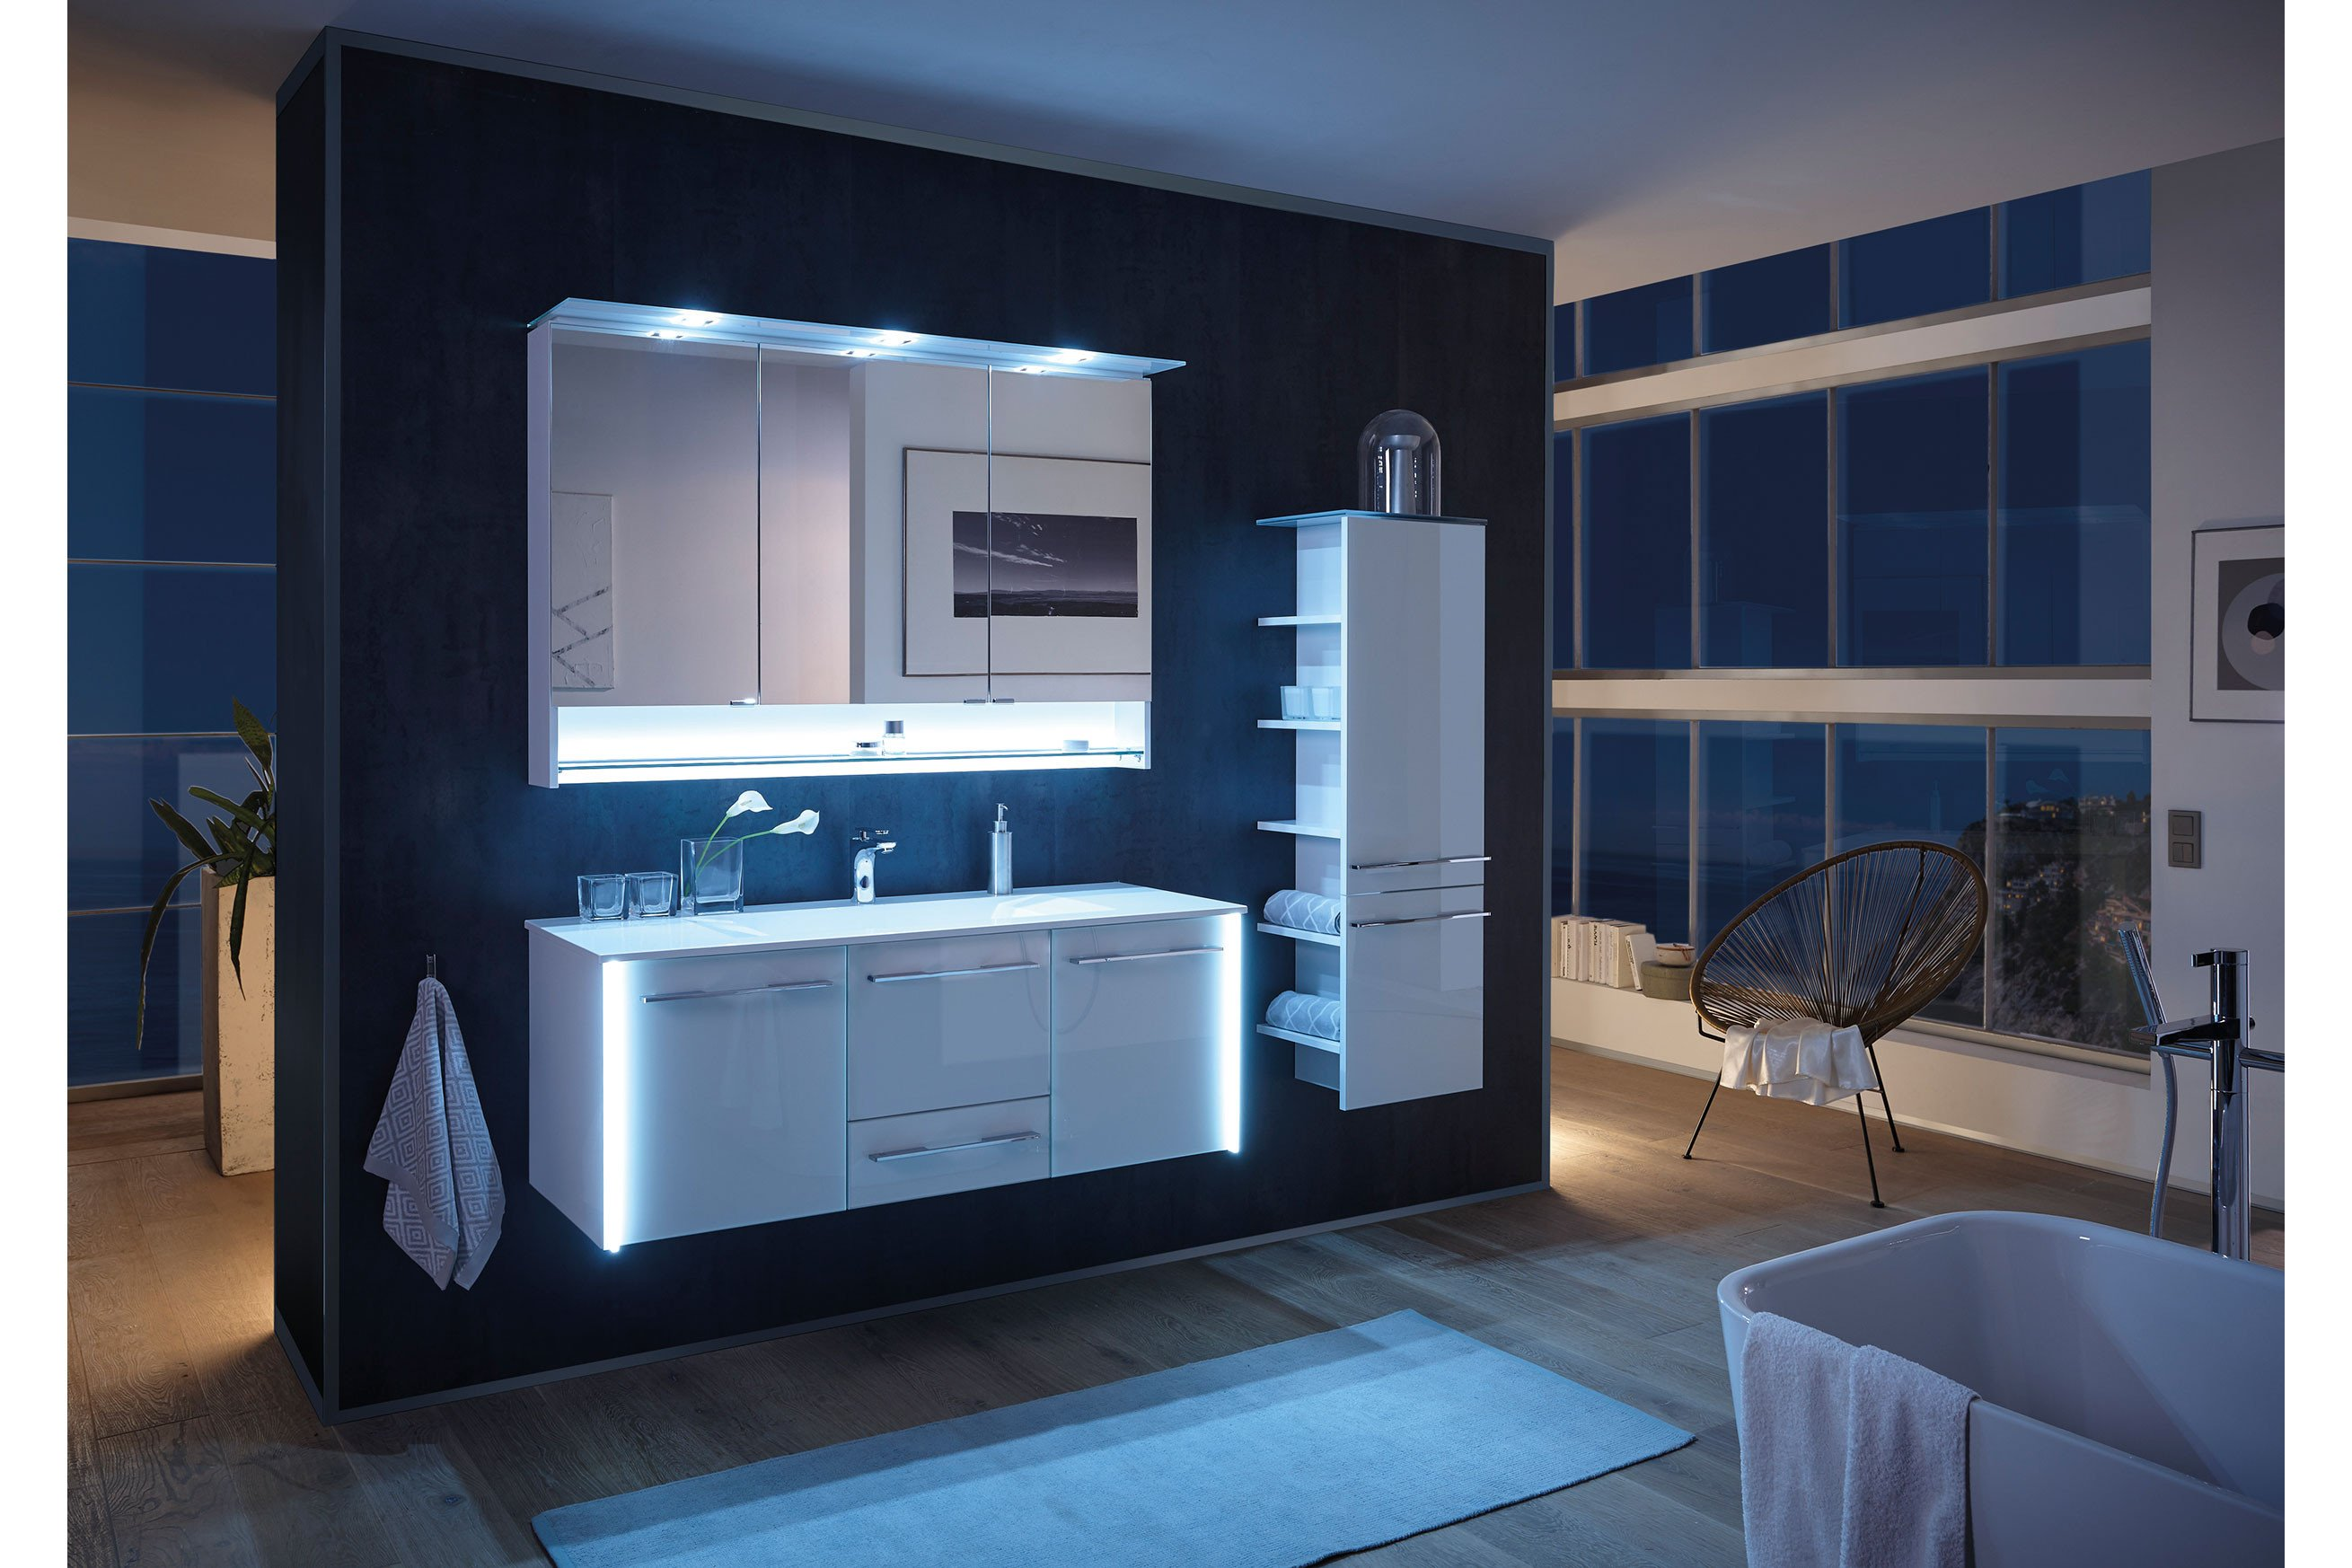 Bad 12 von LEONARDO living - Badezimmer Glas optiwhite Trends